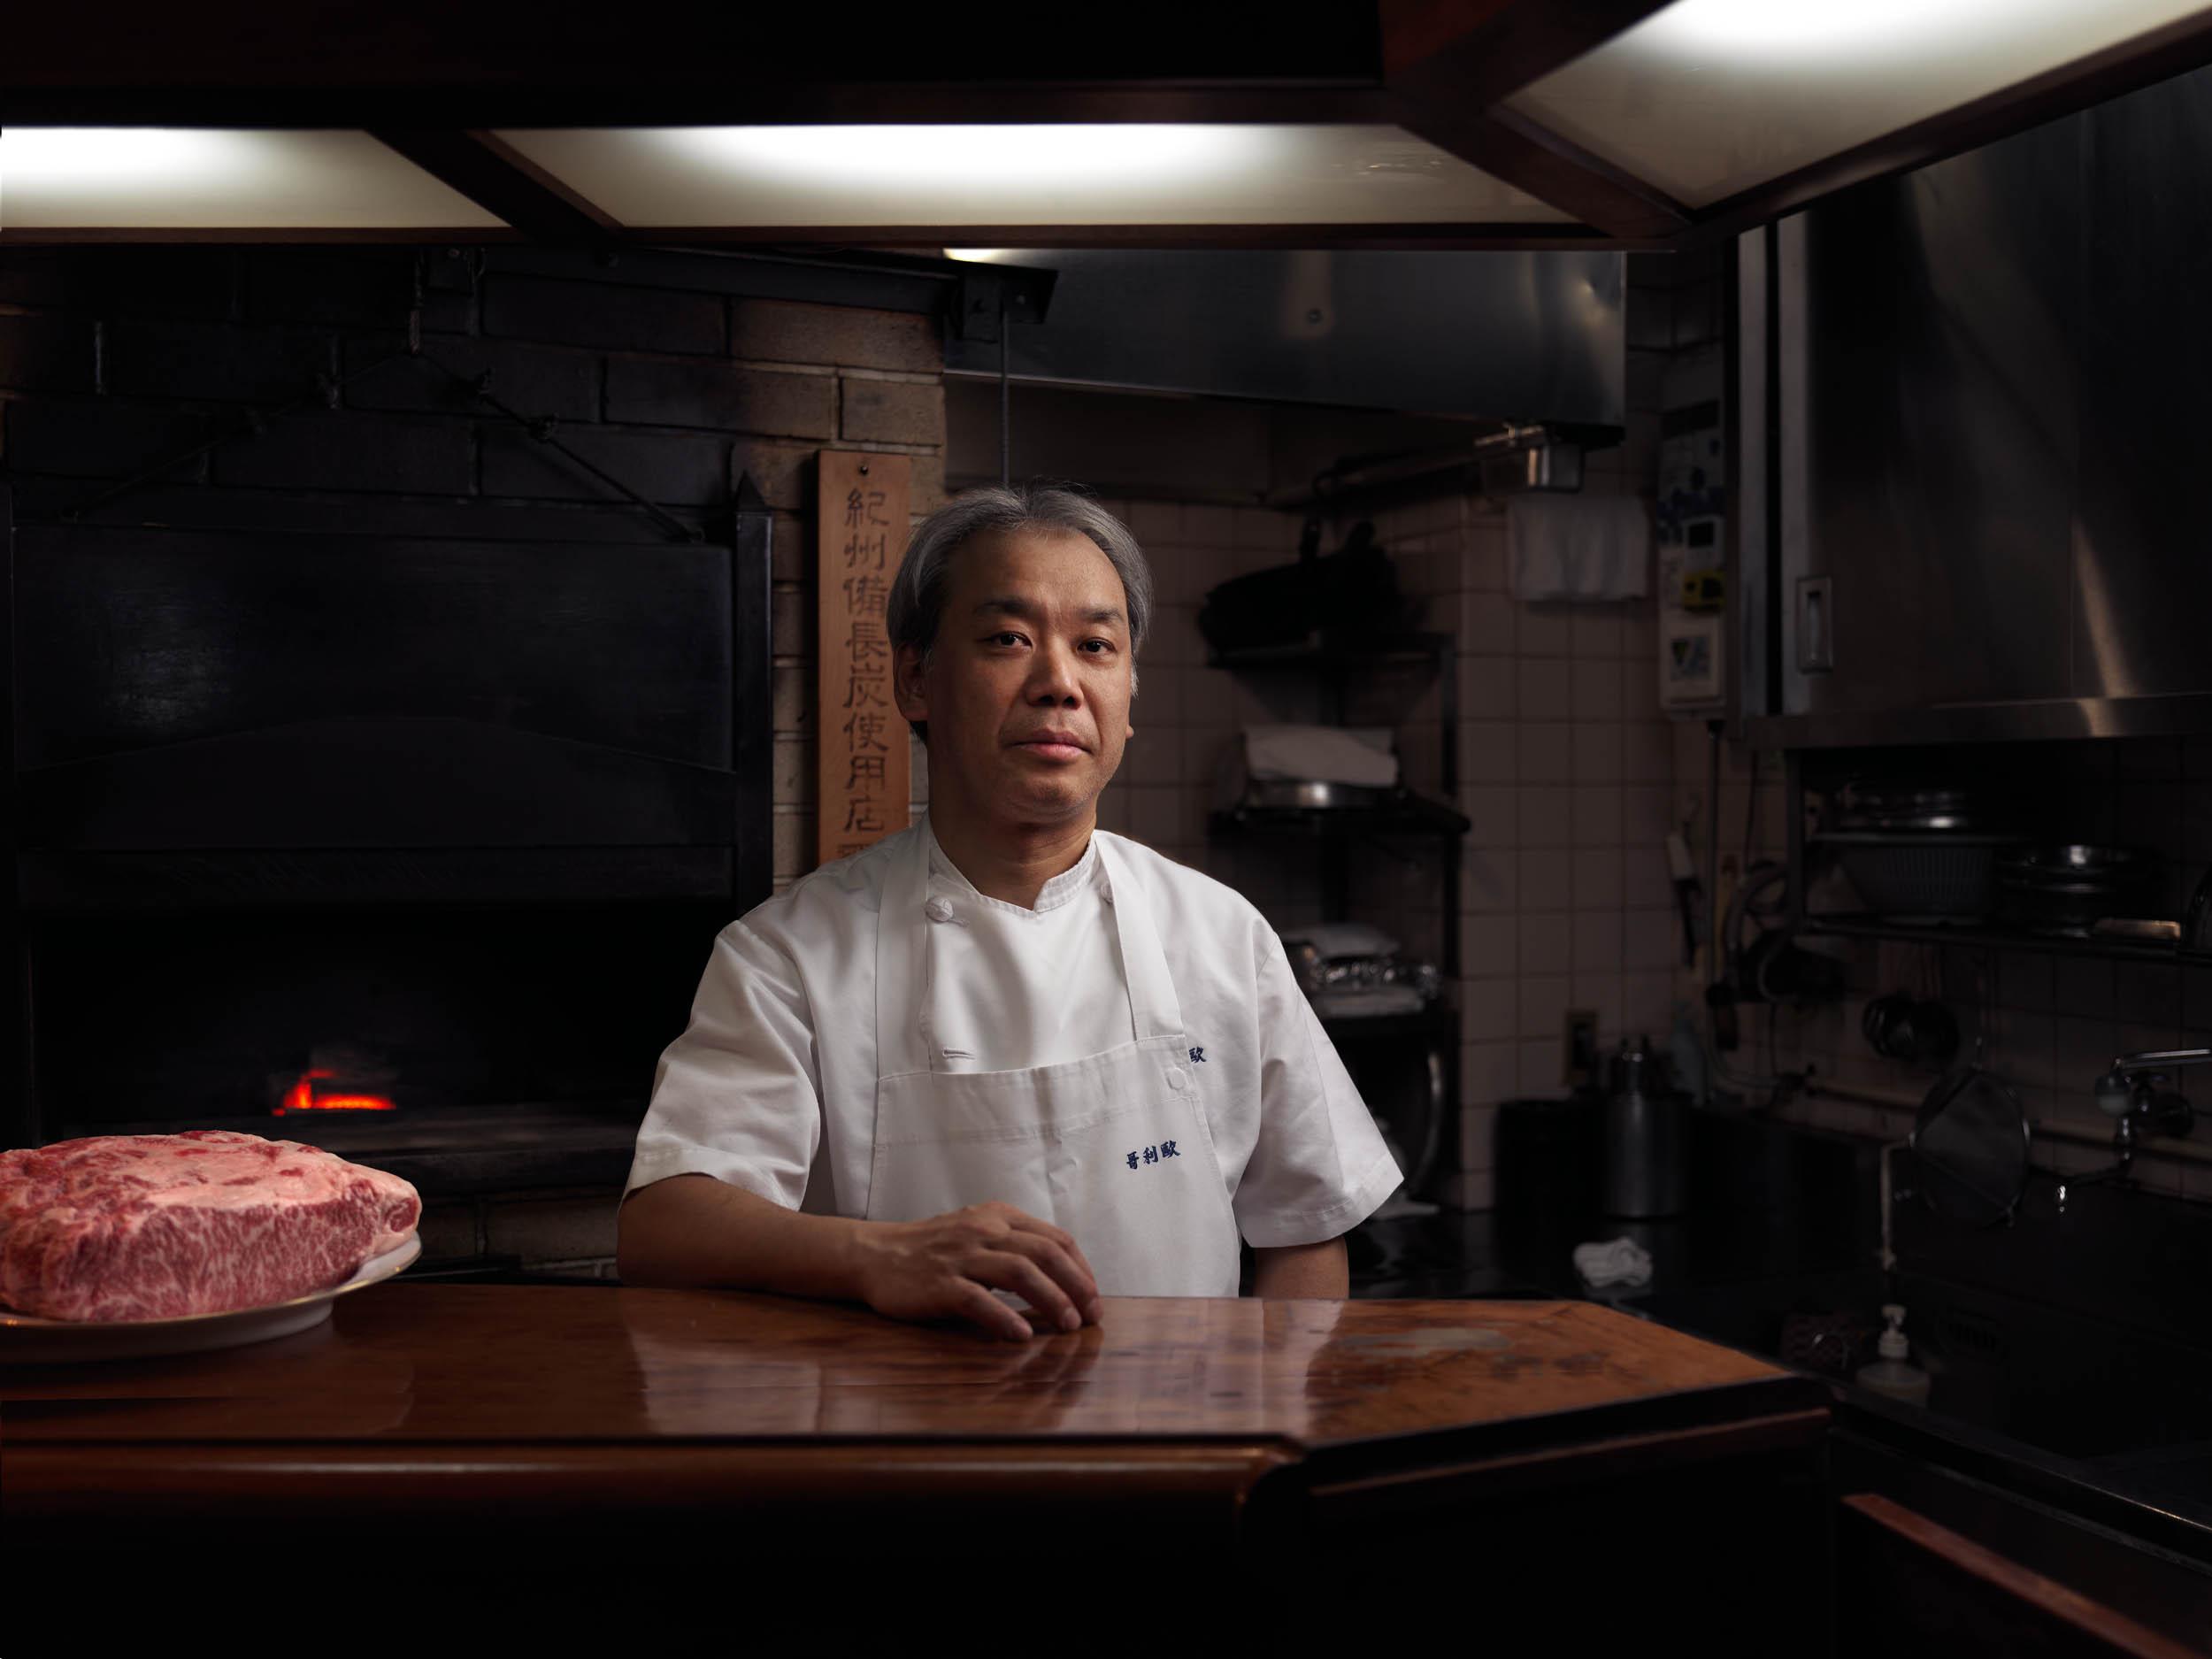 2018 09 06 - Gorio Chef.jpg